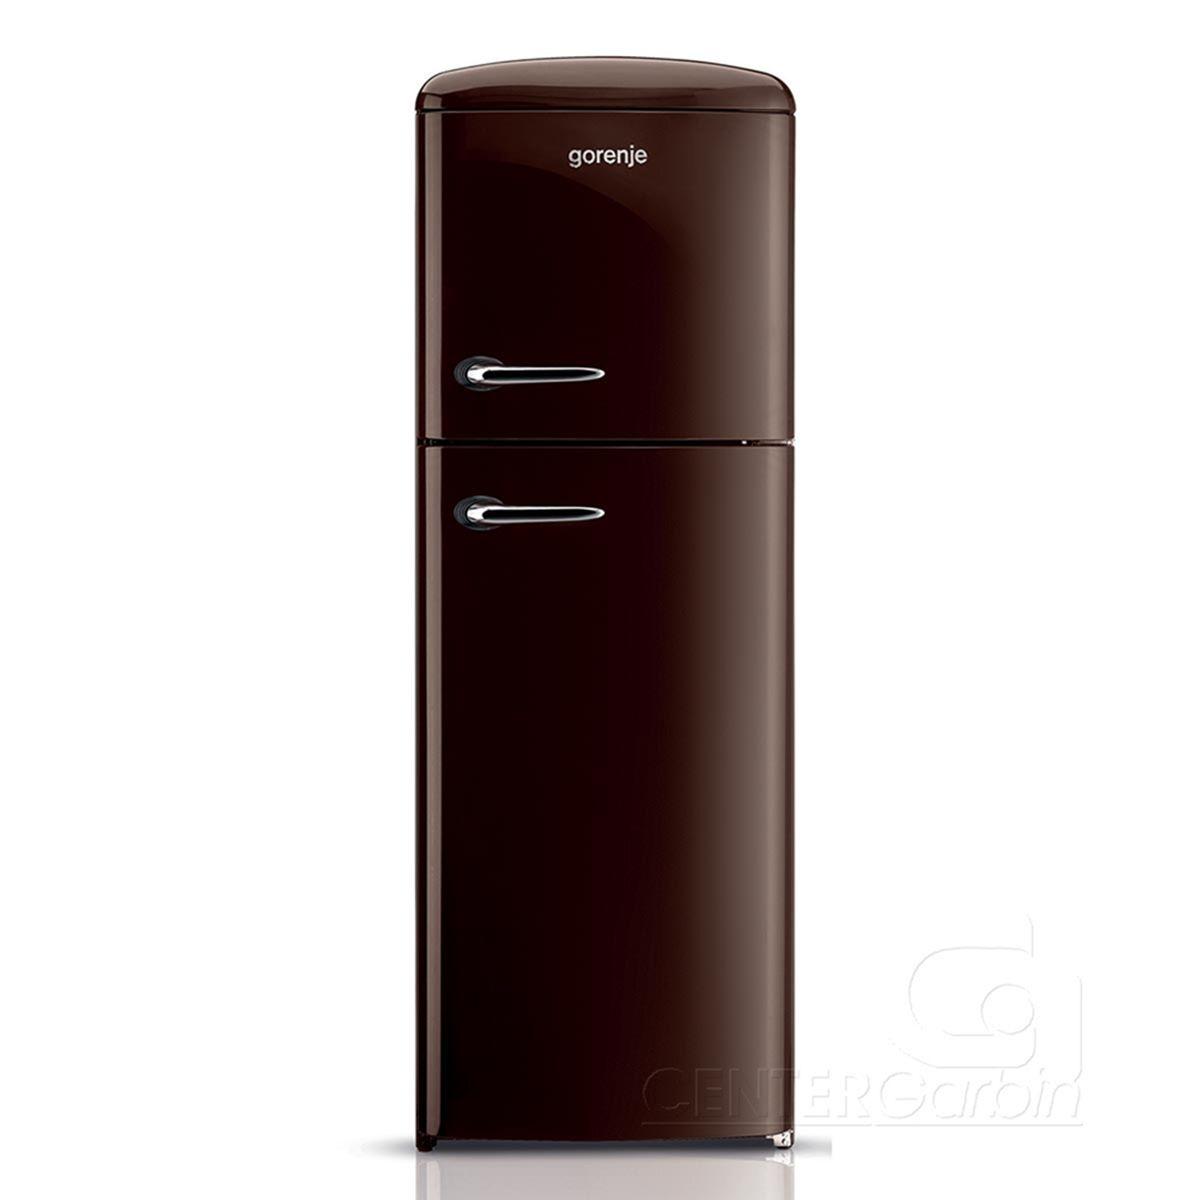 Refrigerador Gorenje Retrô 2 Portas Inverse Dark Chocolate ...